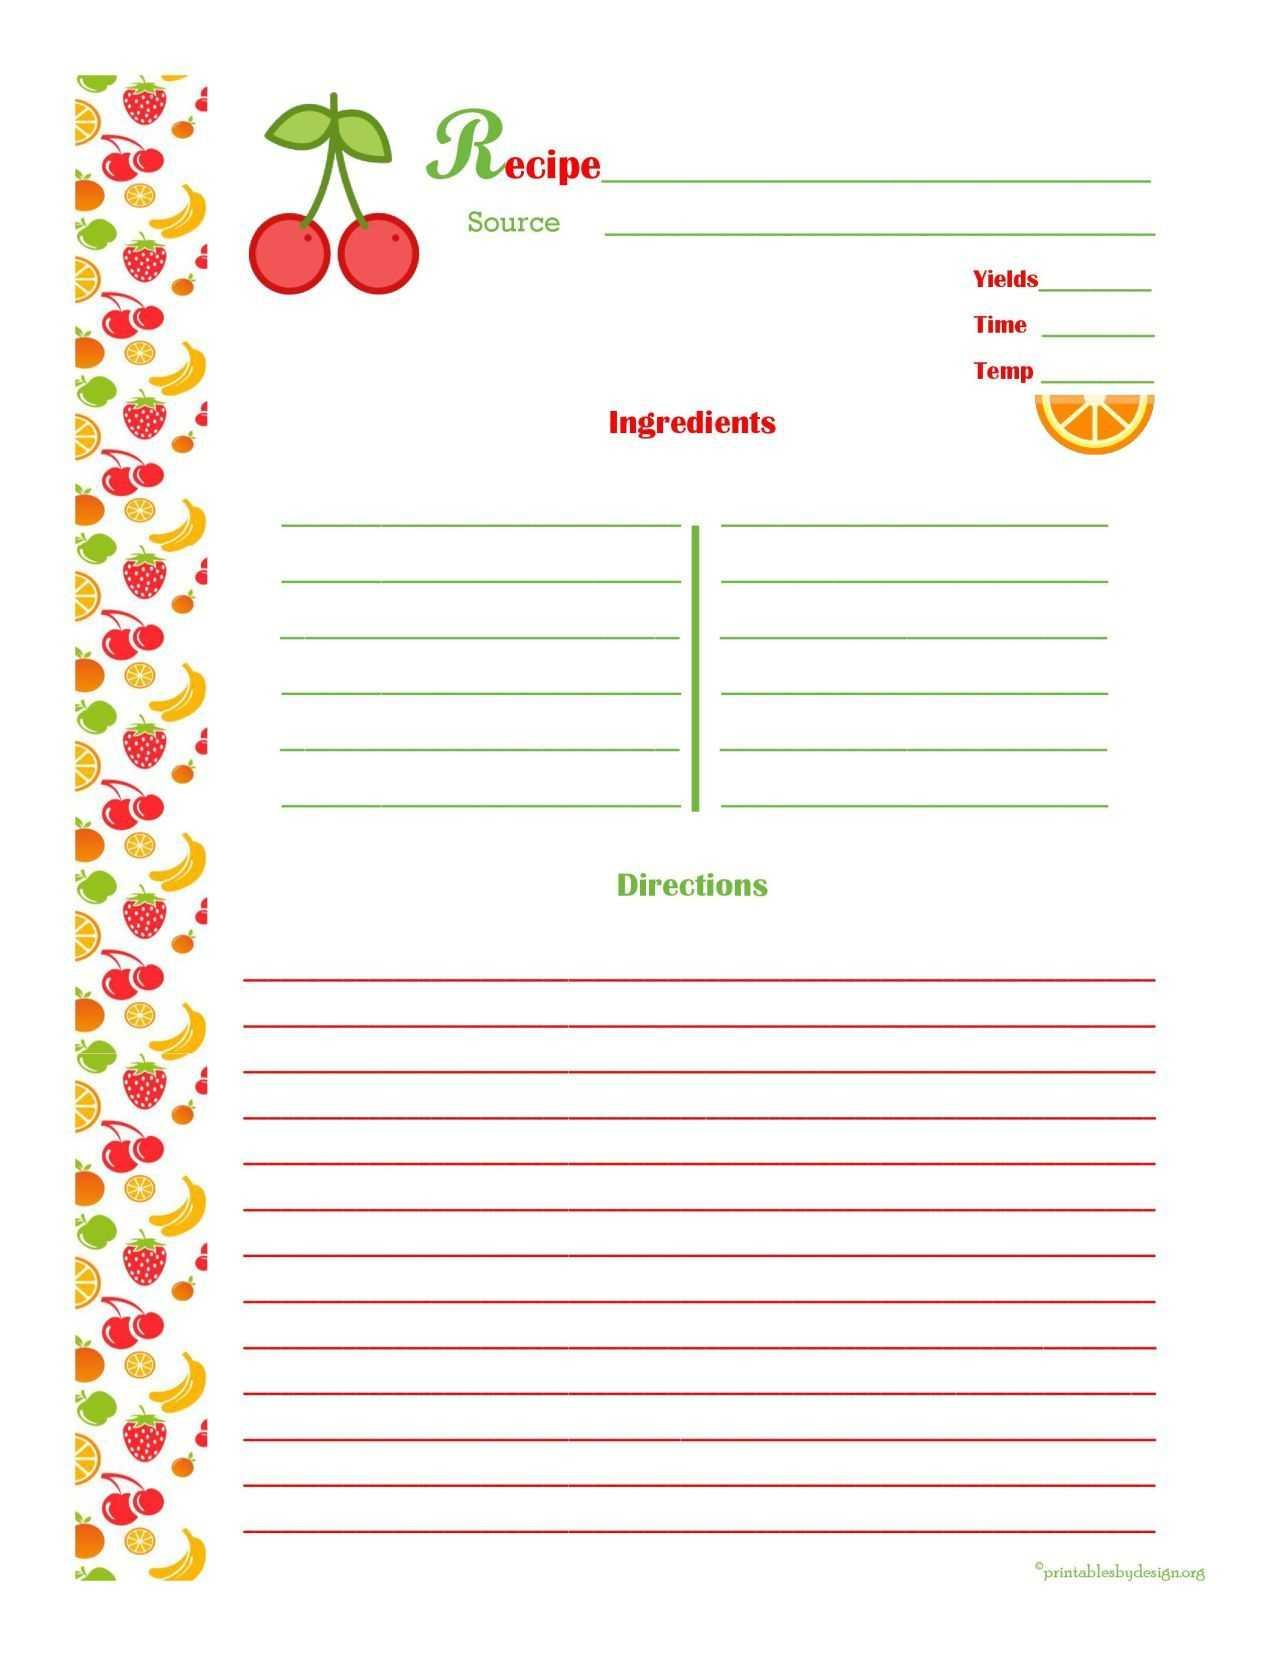 009 Free Recipe Template For Word Ideas Unique 4X6 Card Ms In Full Page Recipe Template For Word